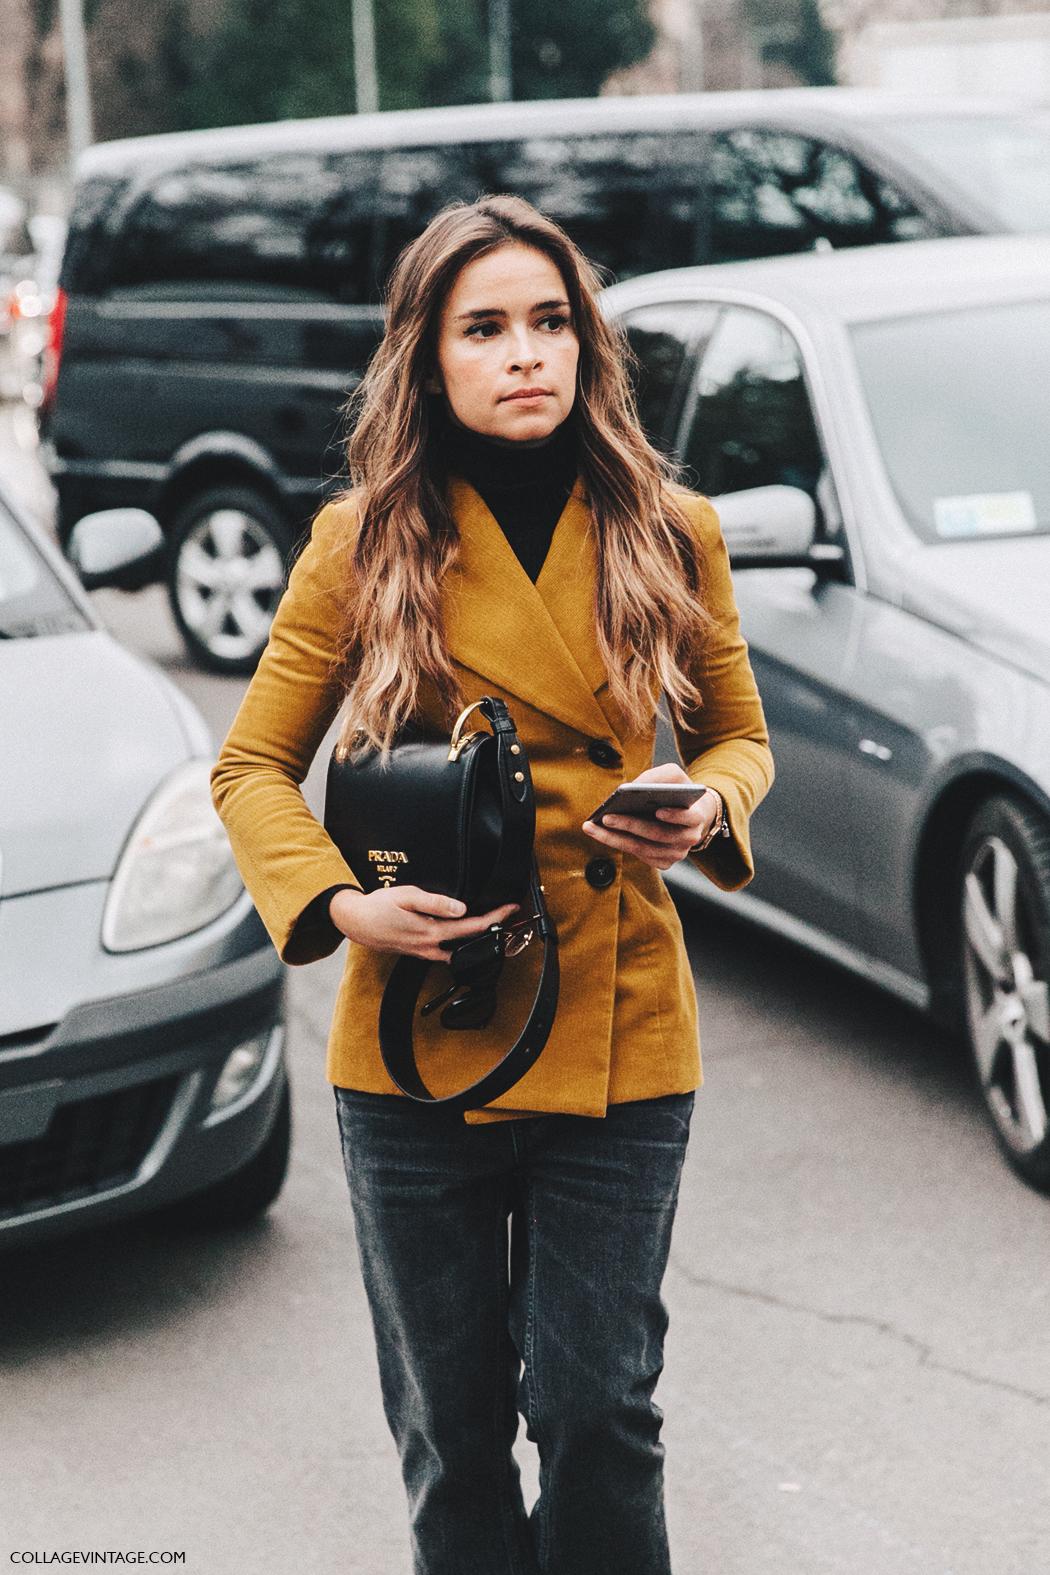 Milan_Fashion_Week_Fall_16-MFW-Street_Style-Collage_Vintage-Miroslava_Duma-Prada_Bag-1